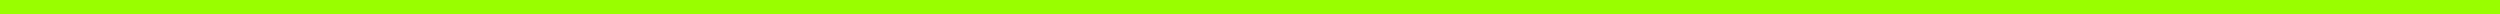 grn line.jpg